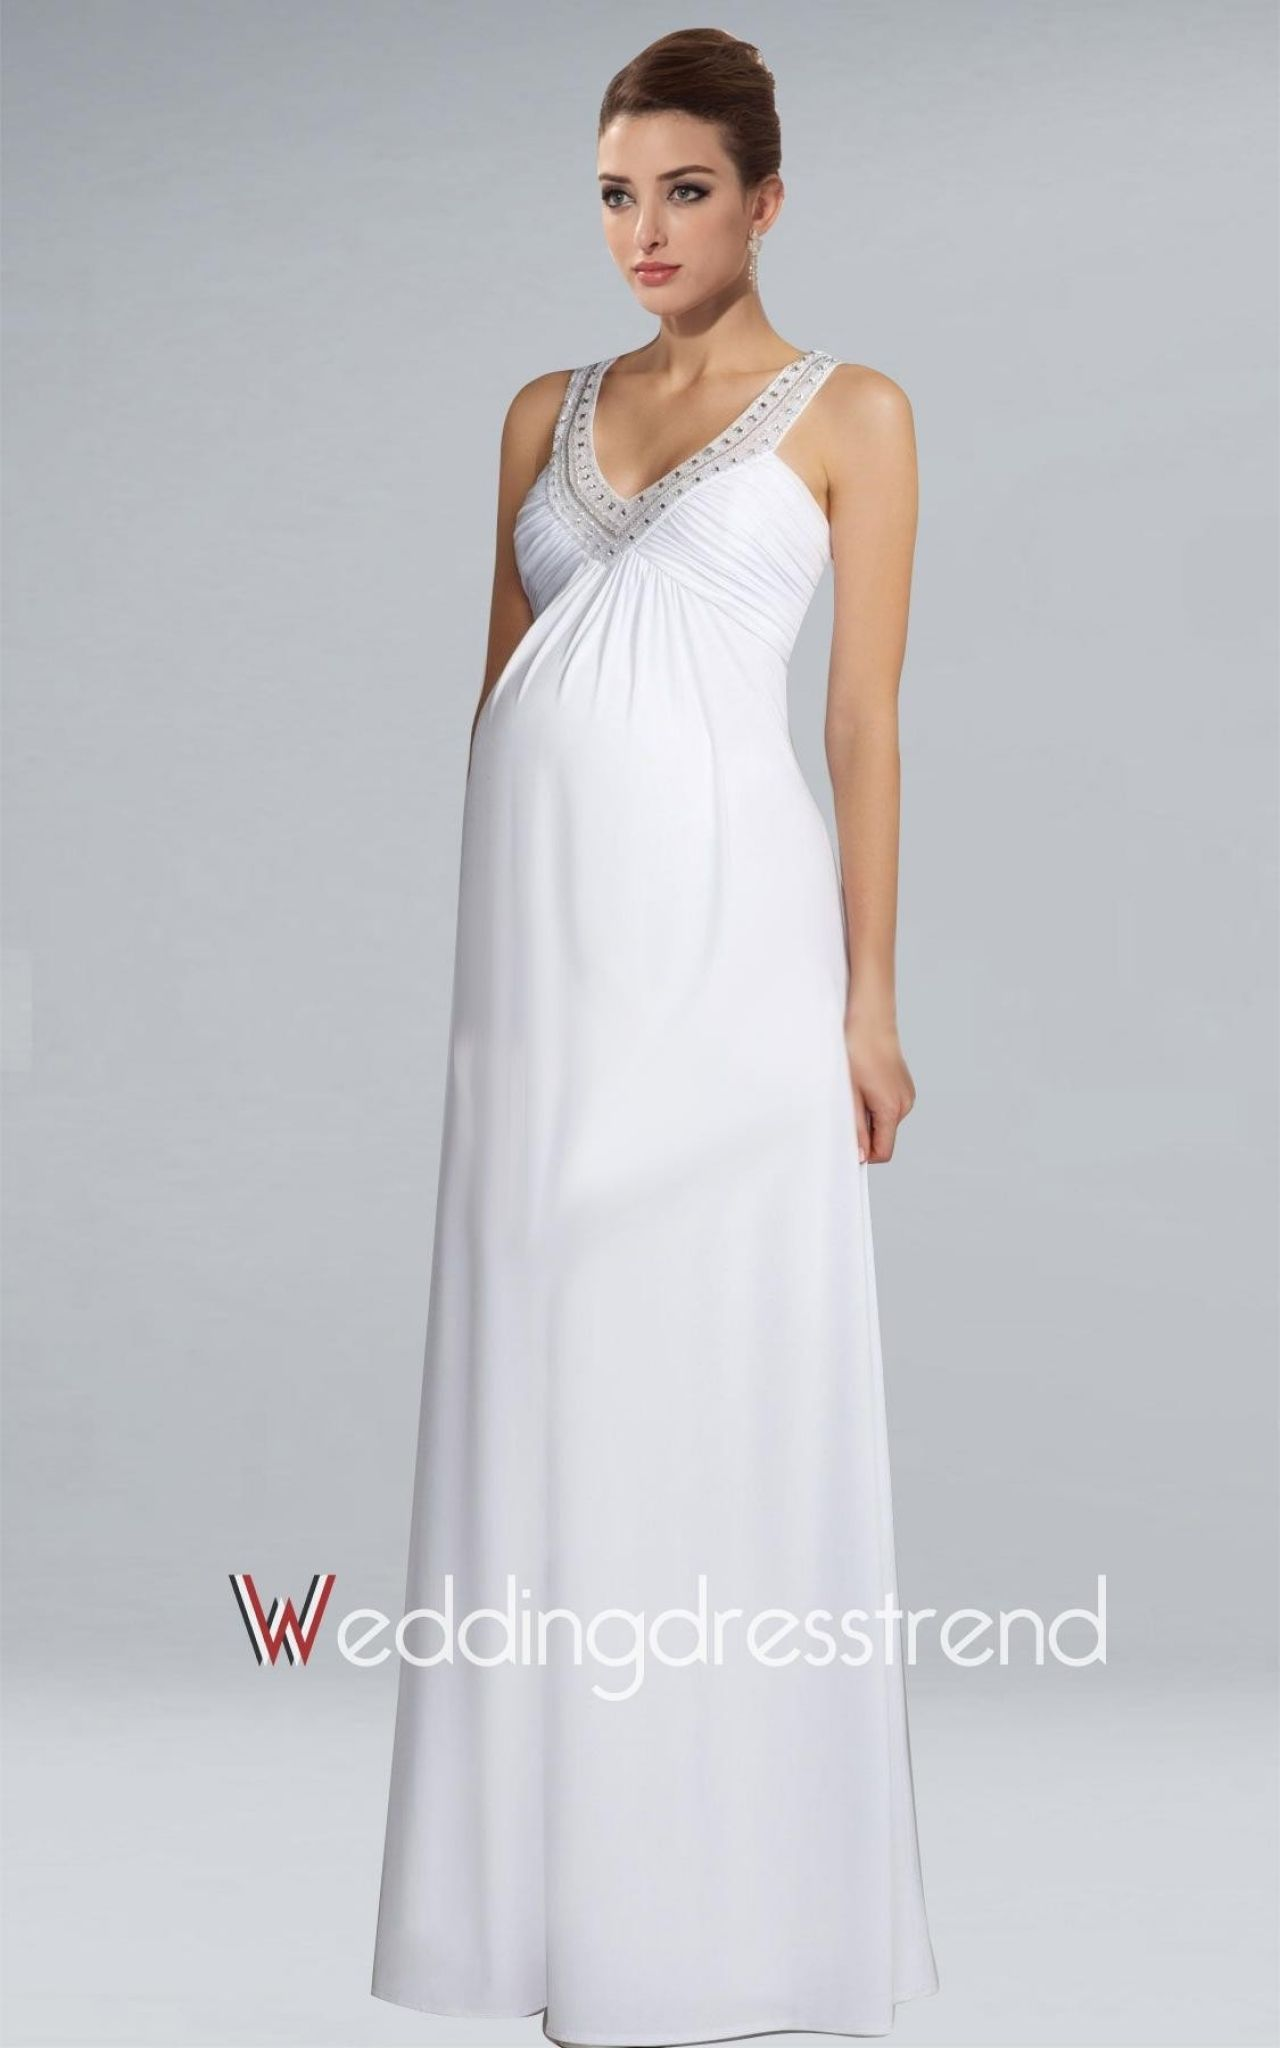 cheap maternity dresses for wedding - wedding dresses for cheap ...